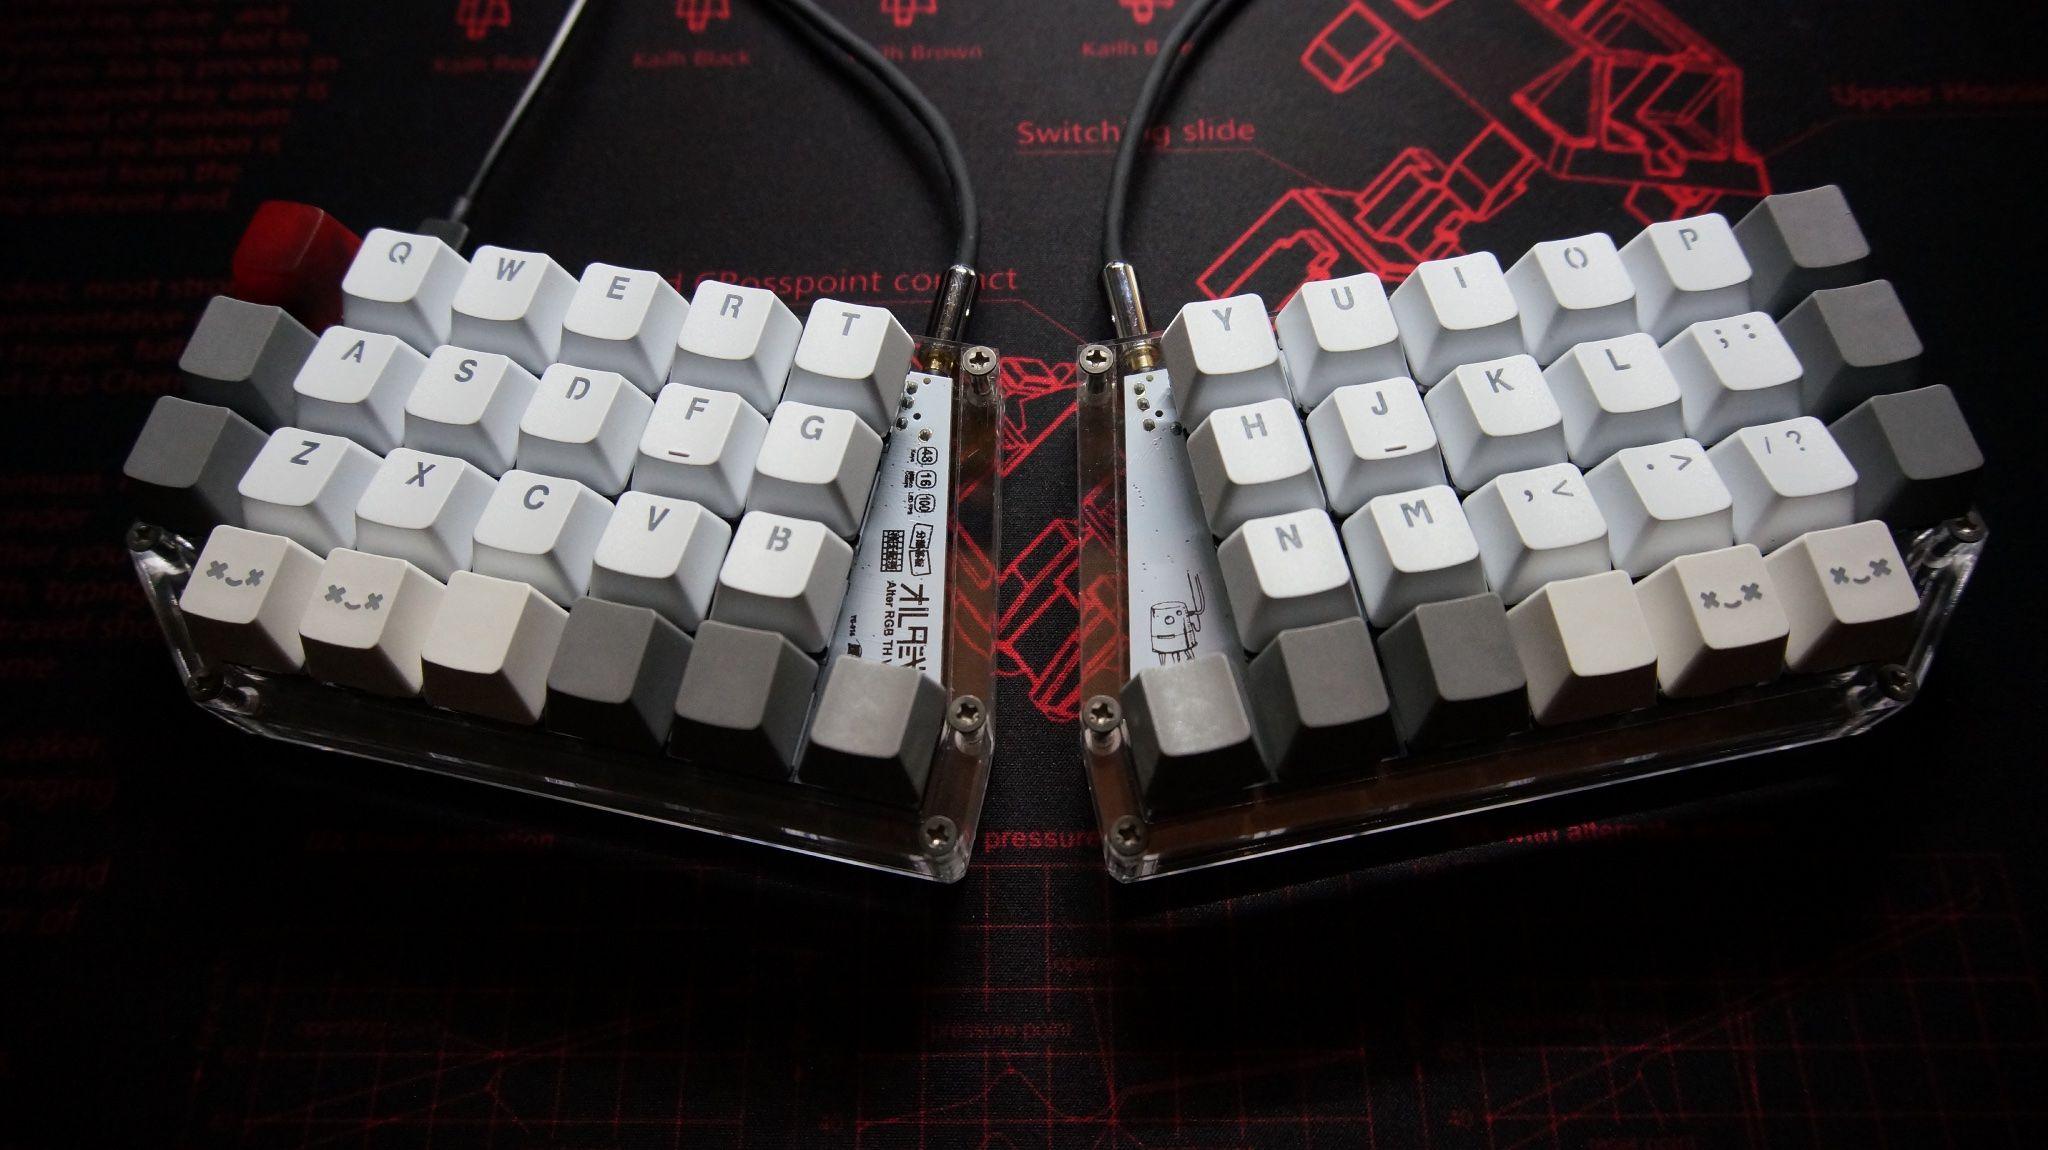 Alter RGB in 2019 | keyboard&caps | Keyboard, Computer keyboard